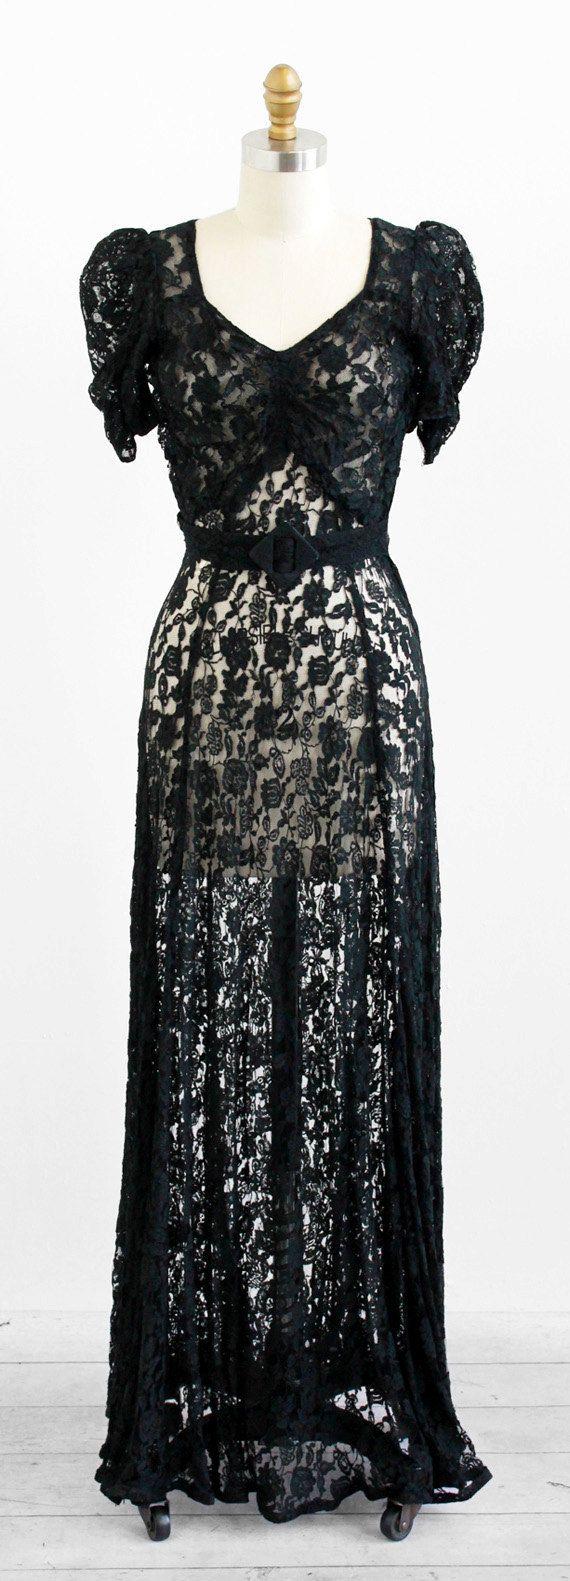 vintage s dress s evening gown Black Lace Floorlength